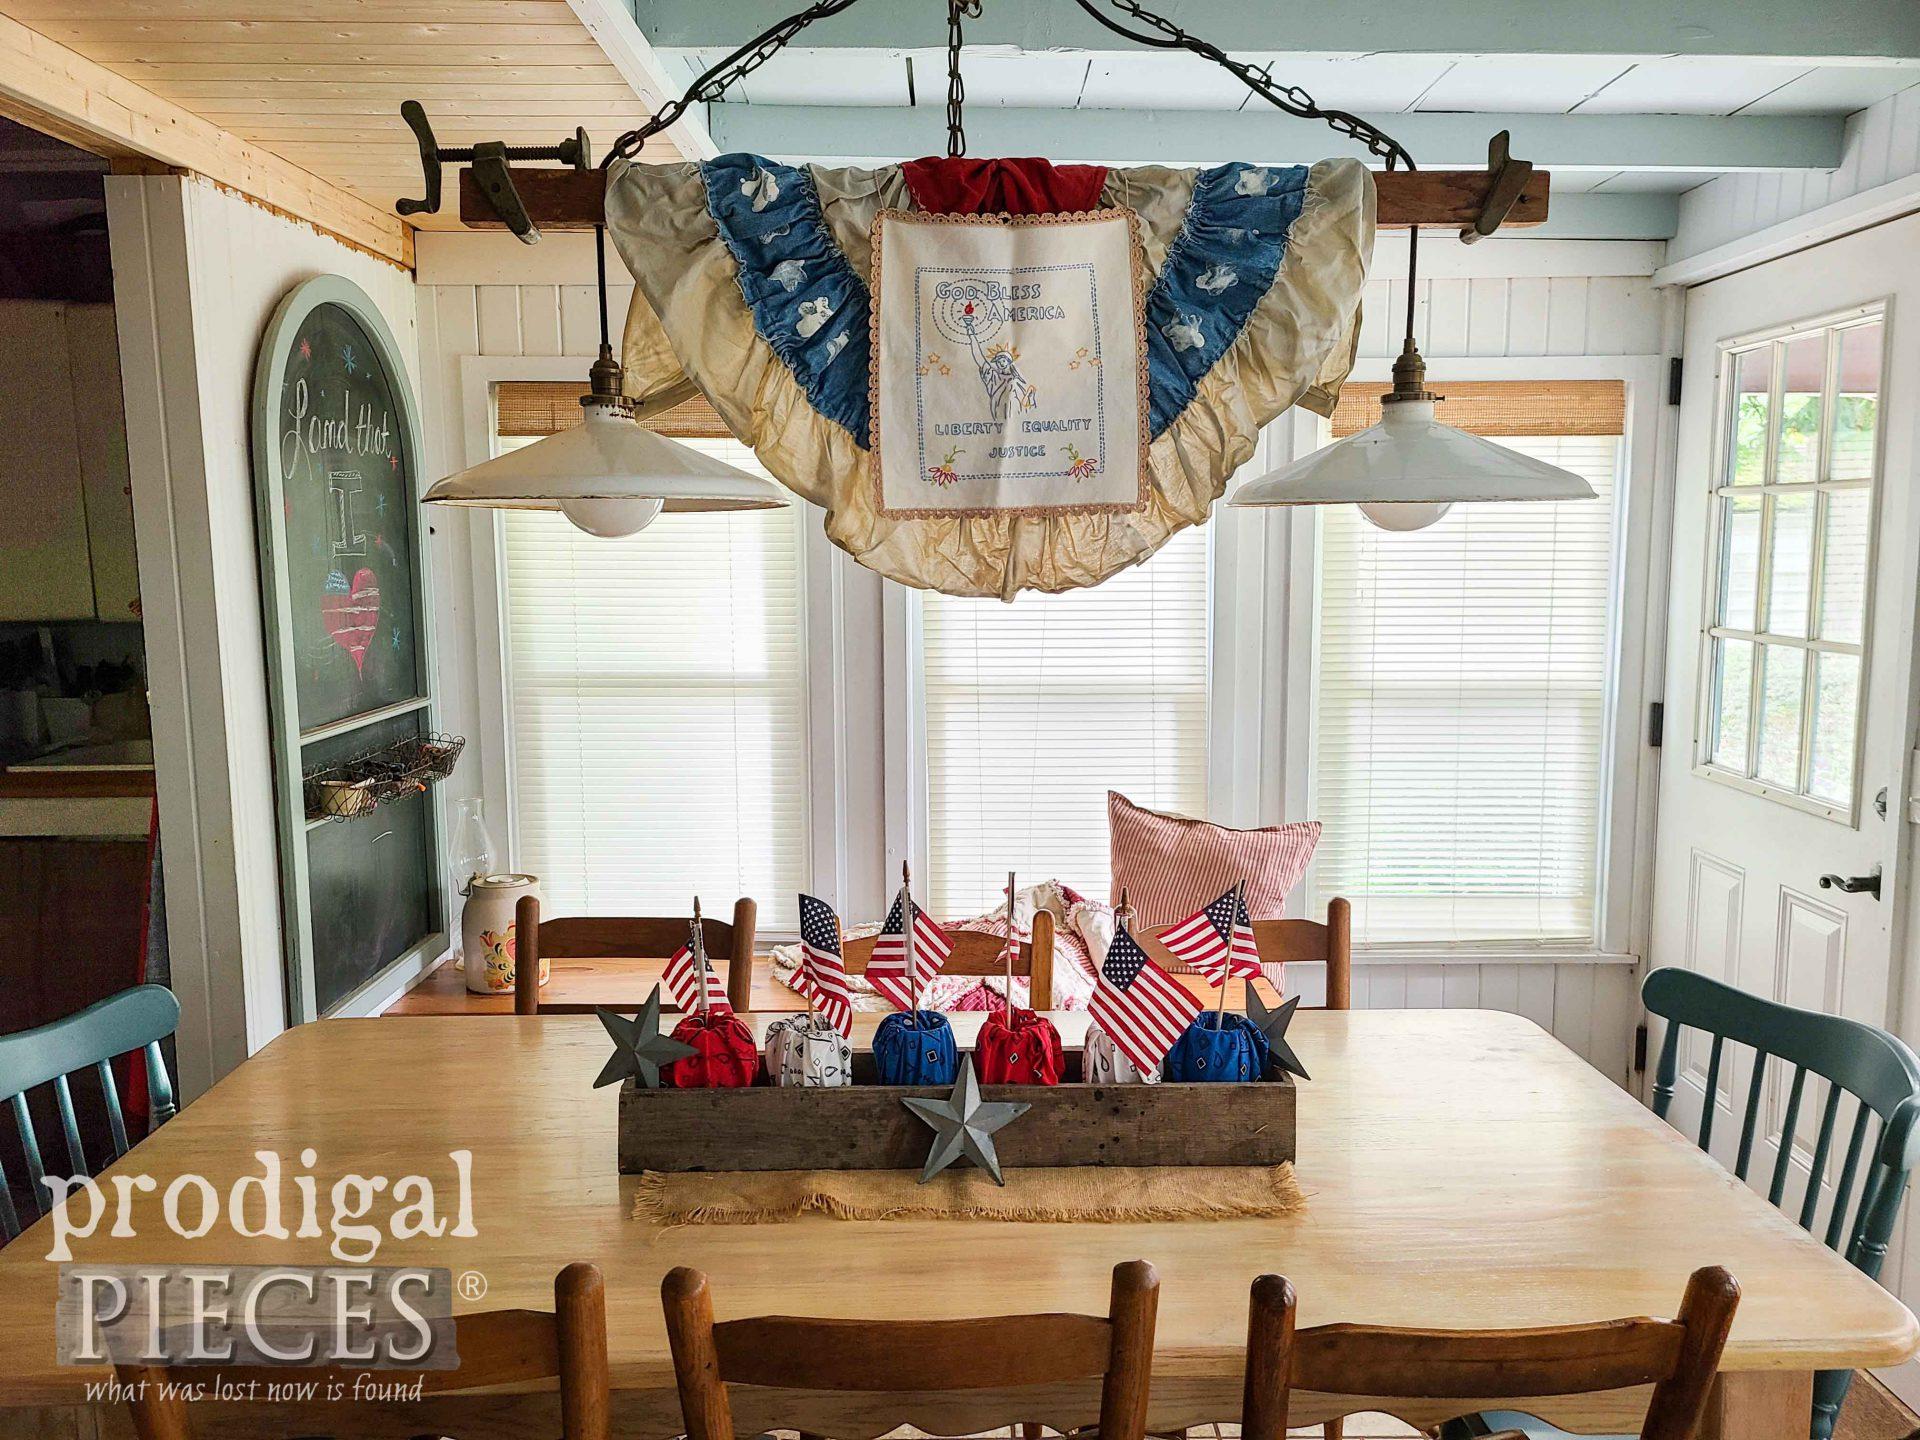 DIY Farmhouse 4th of July Patriotic Decor by Larissa of Prodigal Pieces | prodigalpieces.com #prodigalpieces #diy #farmhouse #home #4thofjuly